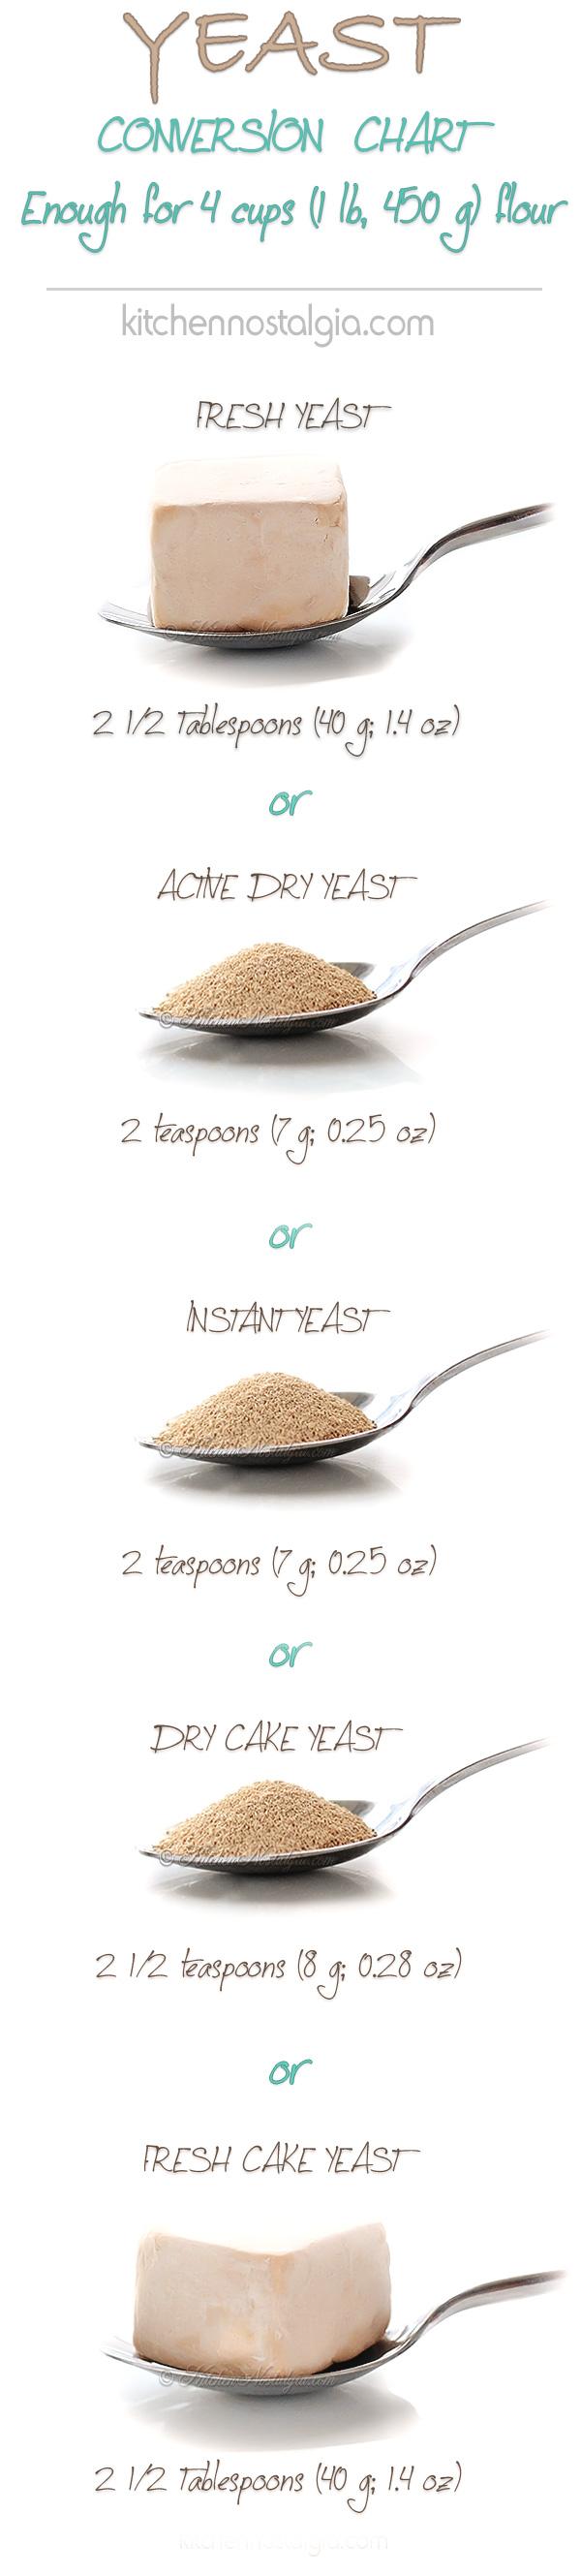 Yeast Conversion Chart - kitchennostalgia.com